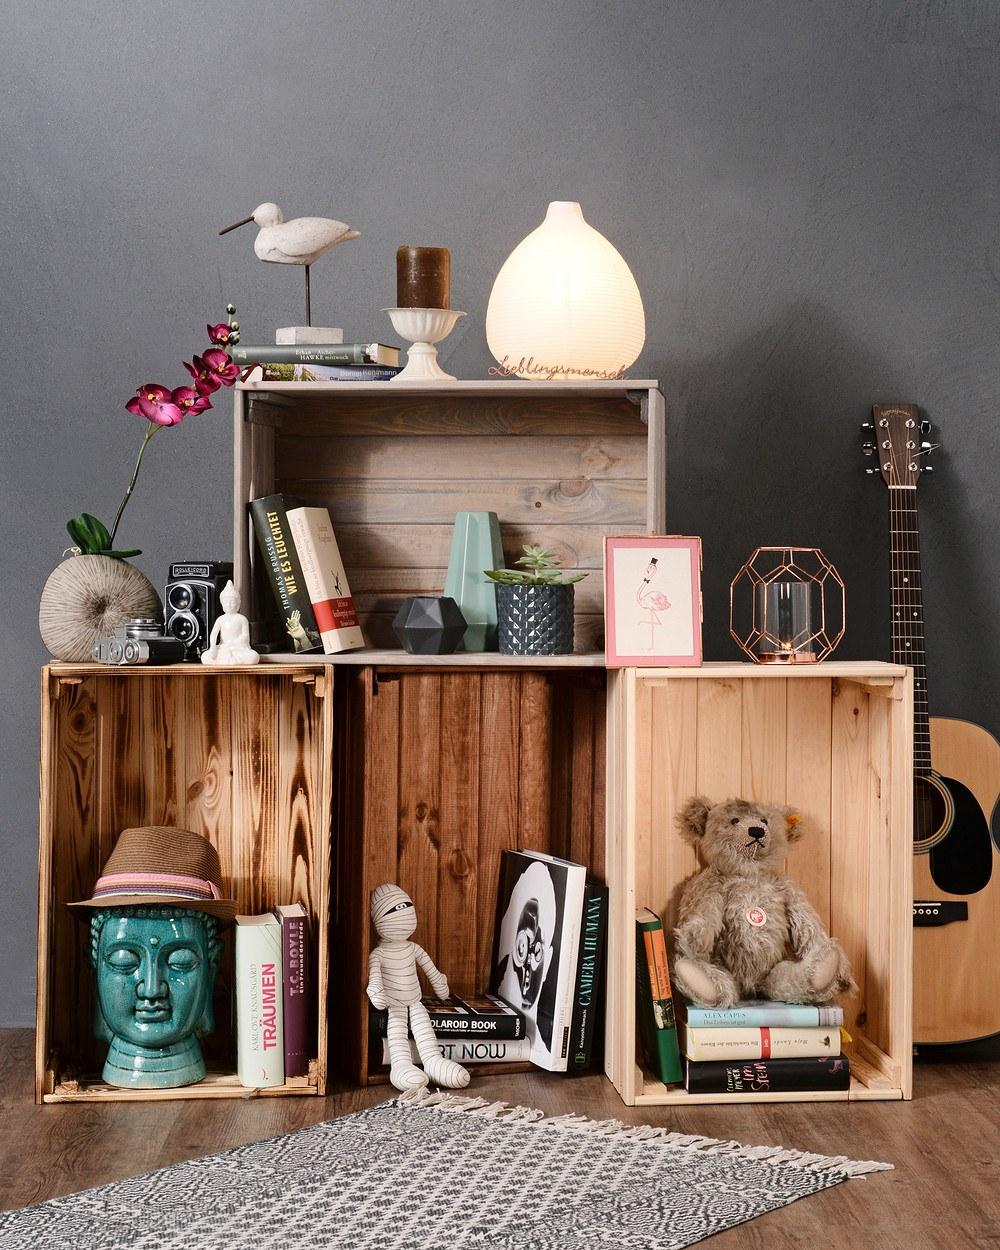 myhomery deko kiste massiv g nstig online kaufen mein. Black Bedroom Furniture Sets. Home Design Ideas